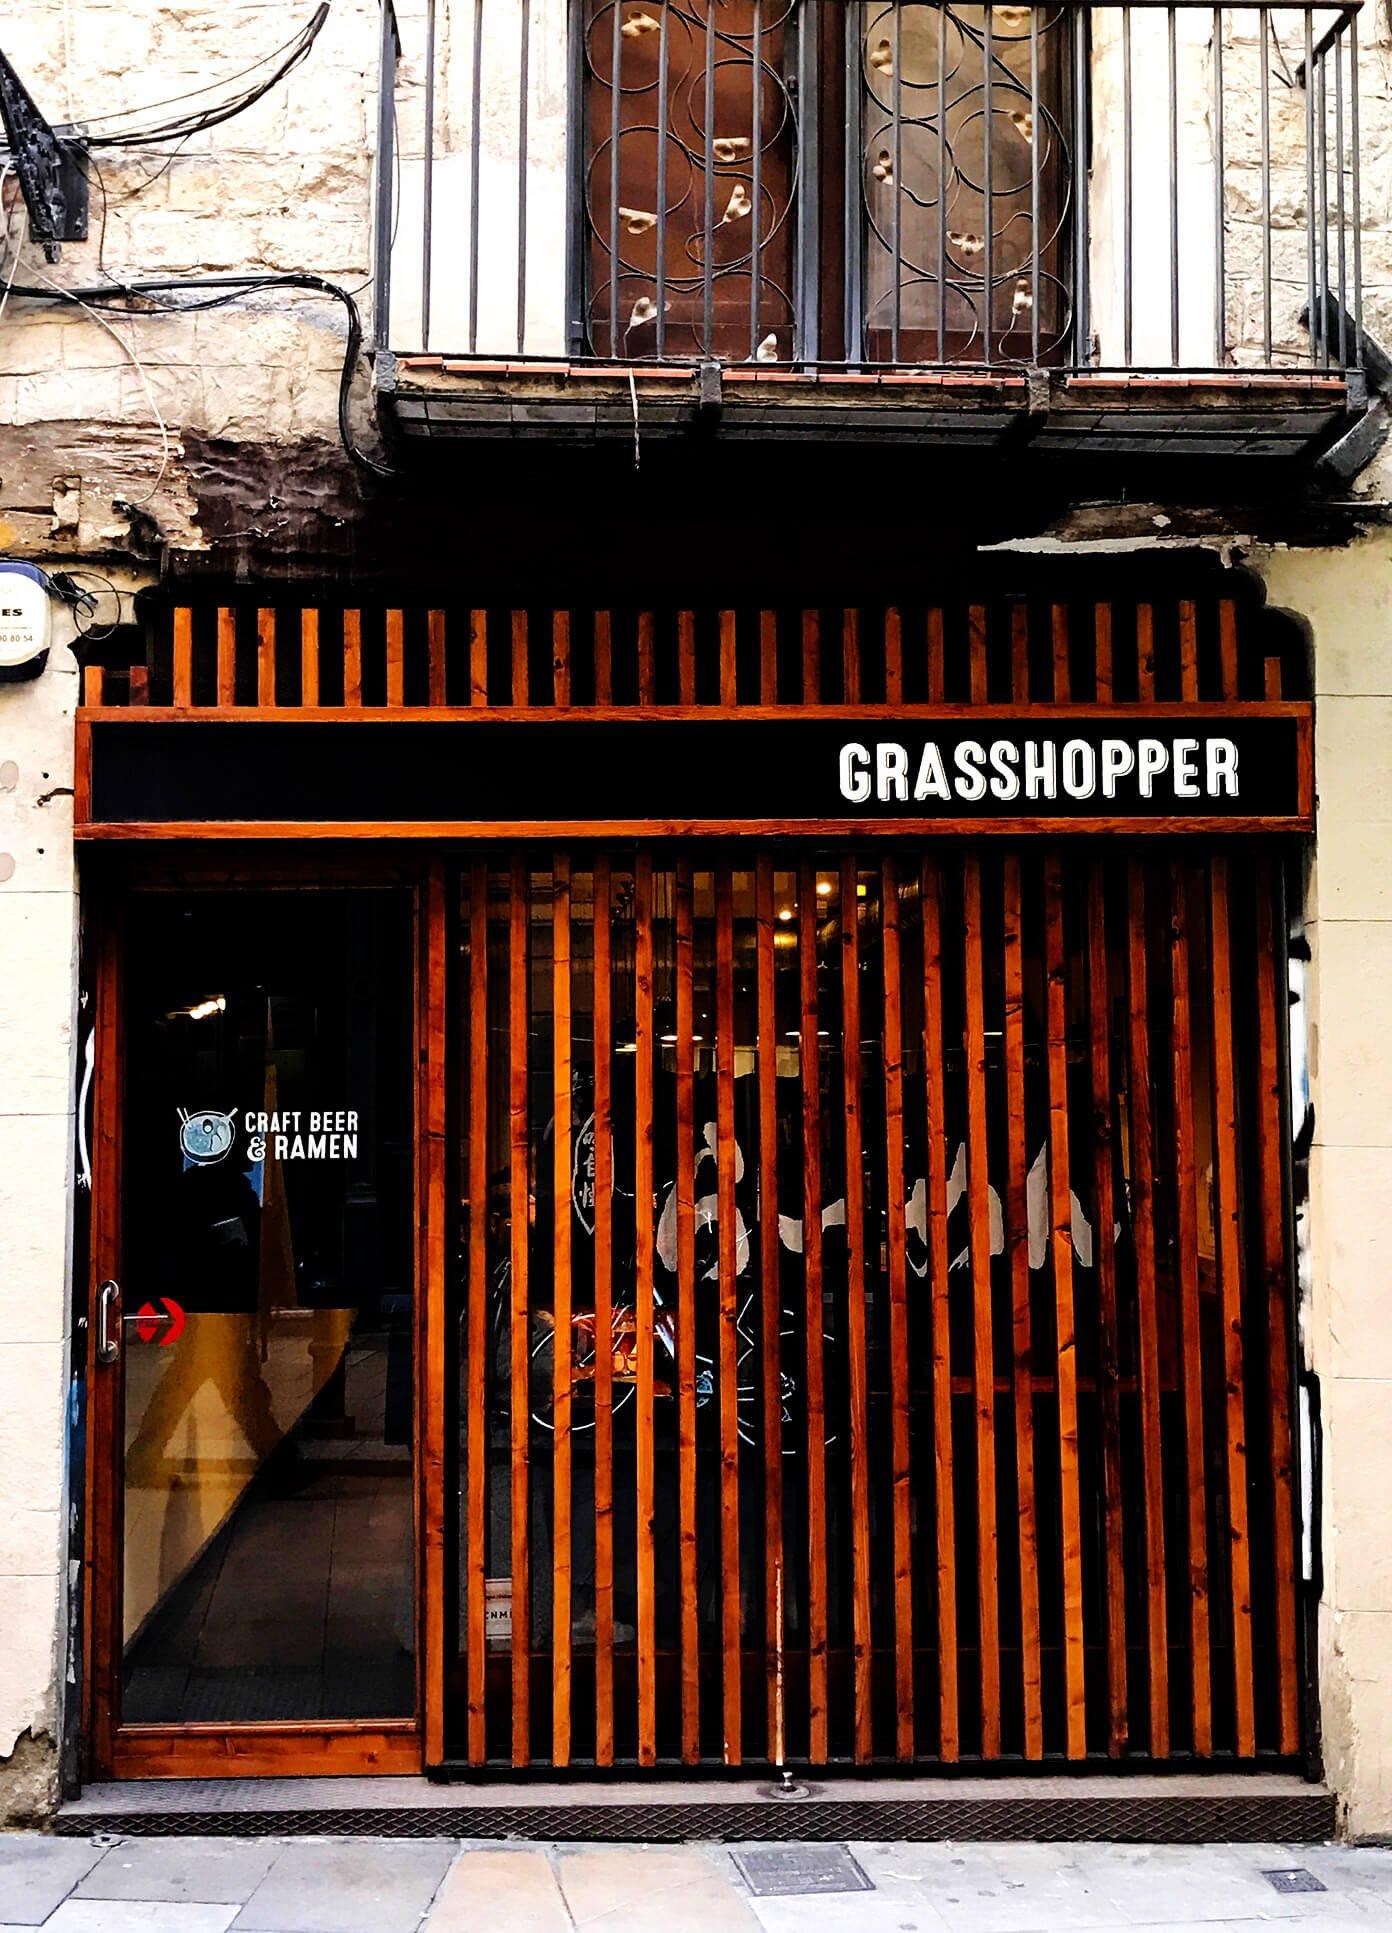 Grasshopper ramen bar | Gimme Some Barcelona Travel Guide